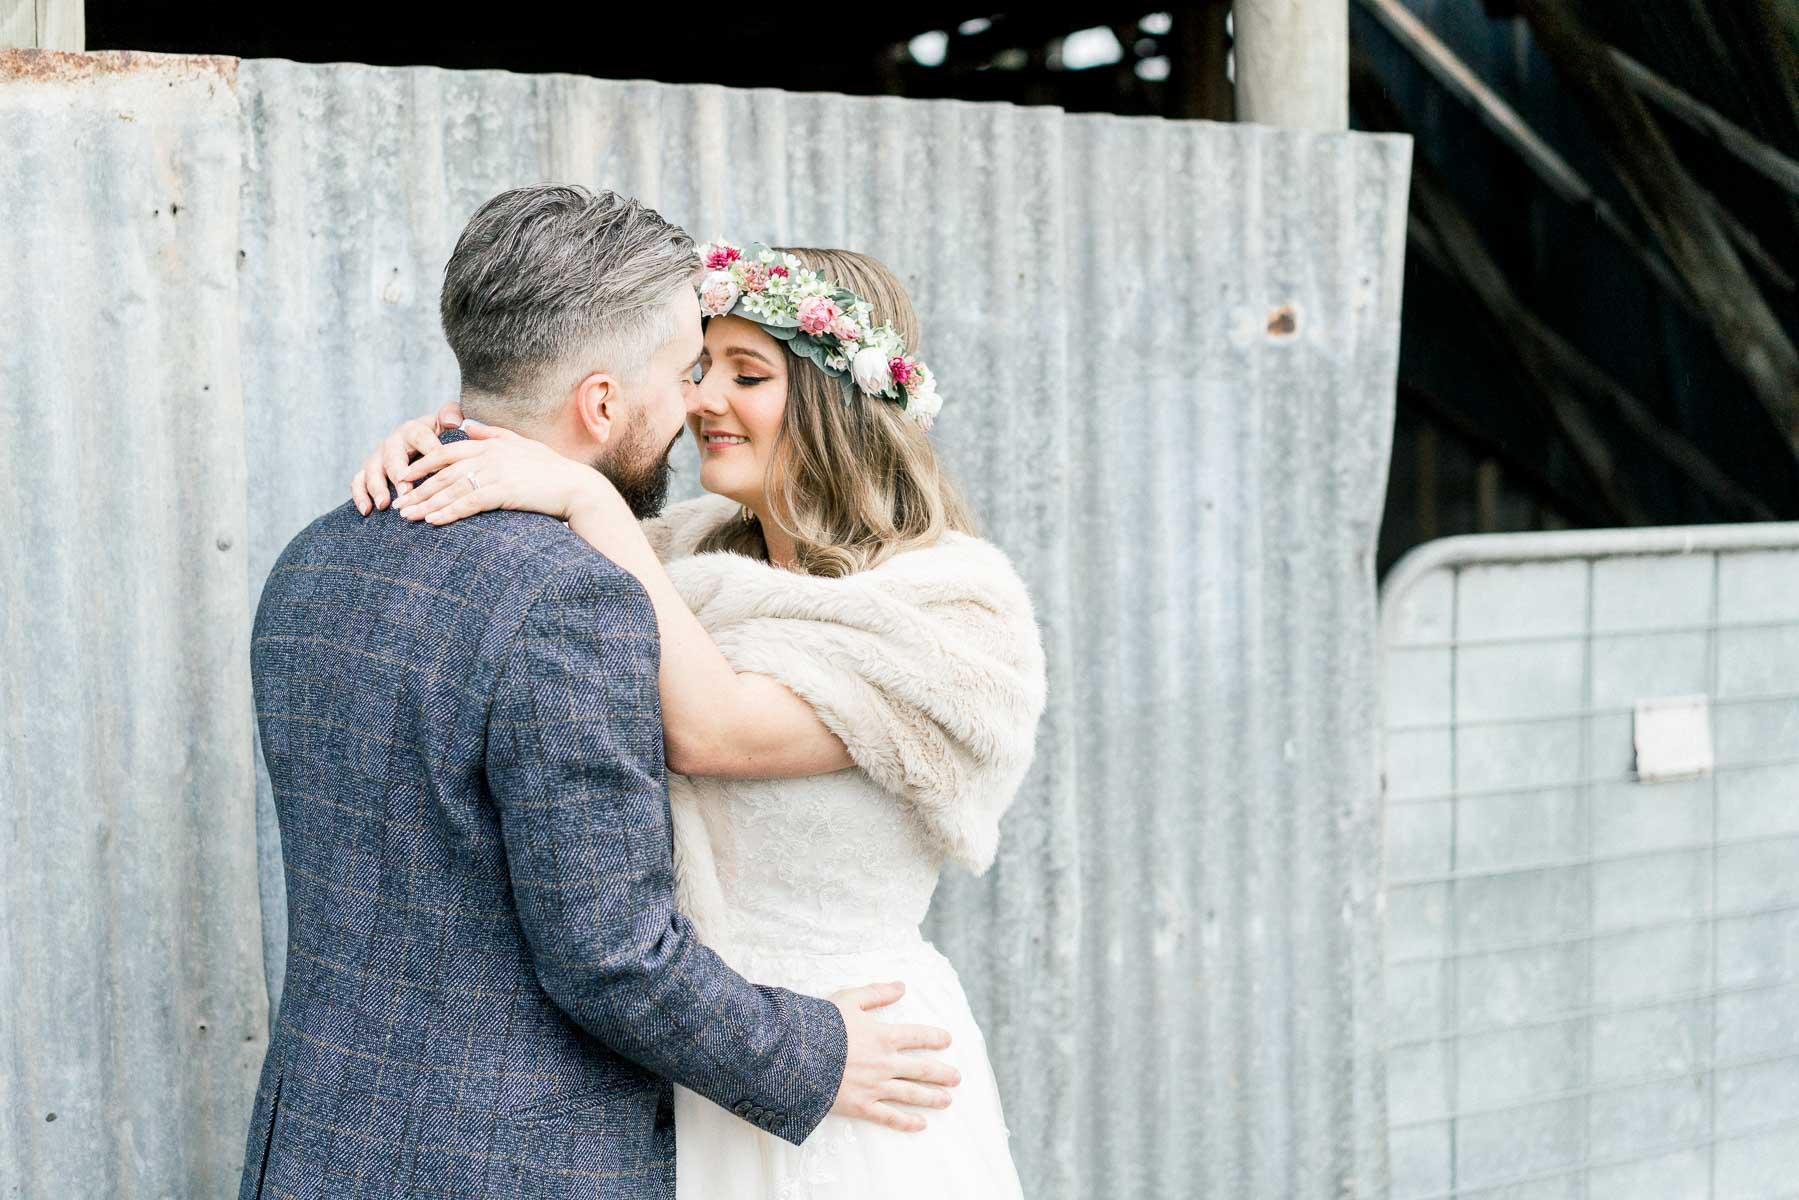 adams-farm-coldstream-yarra-valley-wedding-heart+soul-weddings-kel-jarryd-05793.jpg